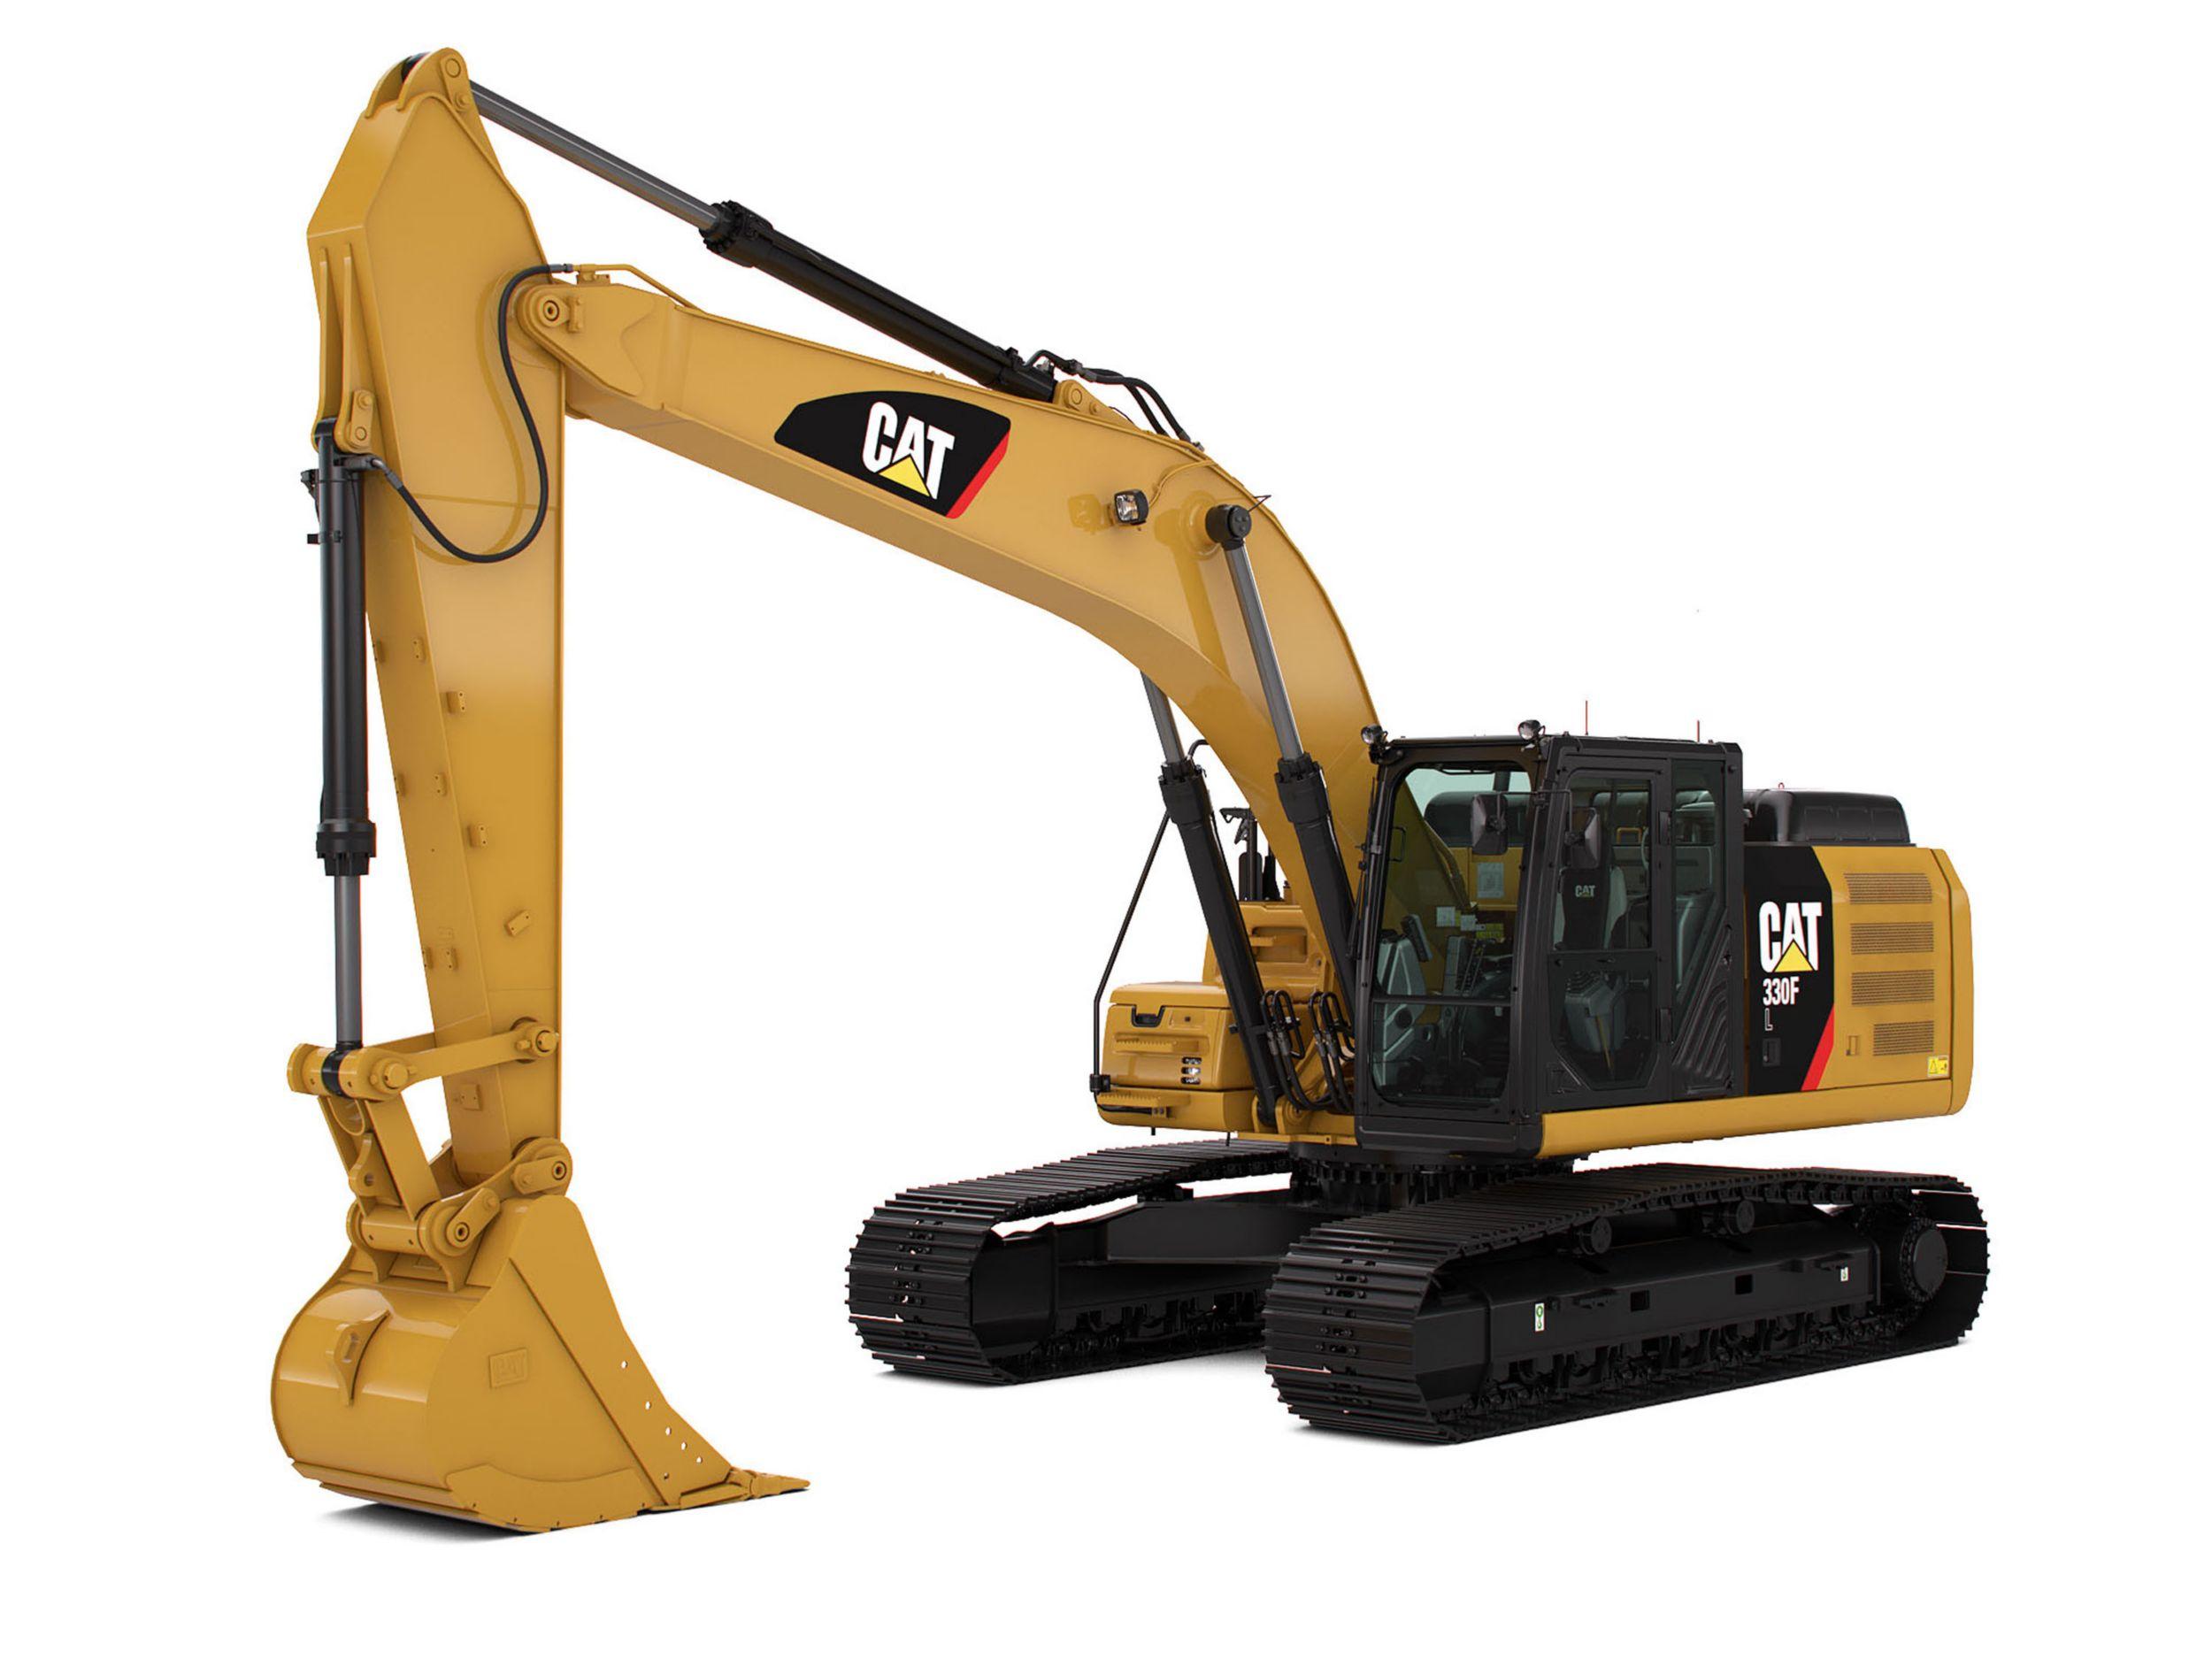 330F Medium Hydraulic Excavator